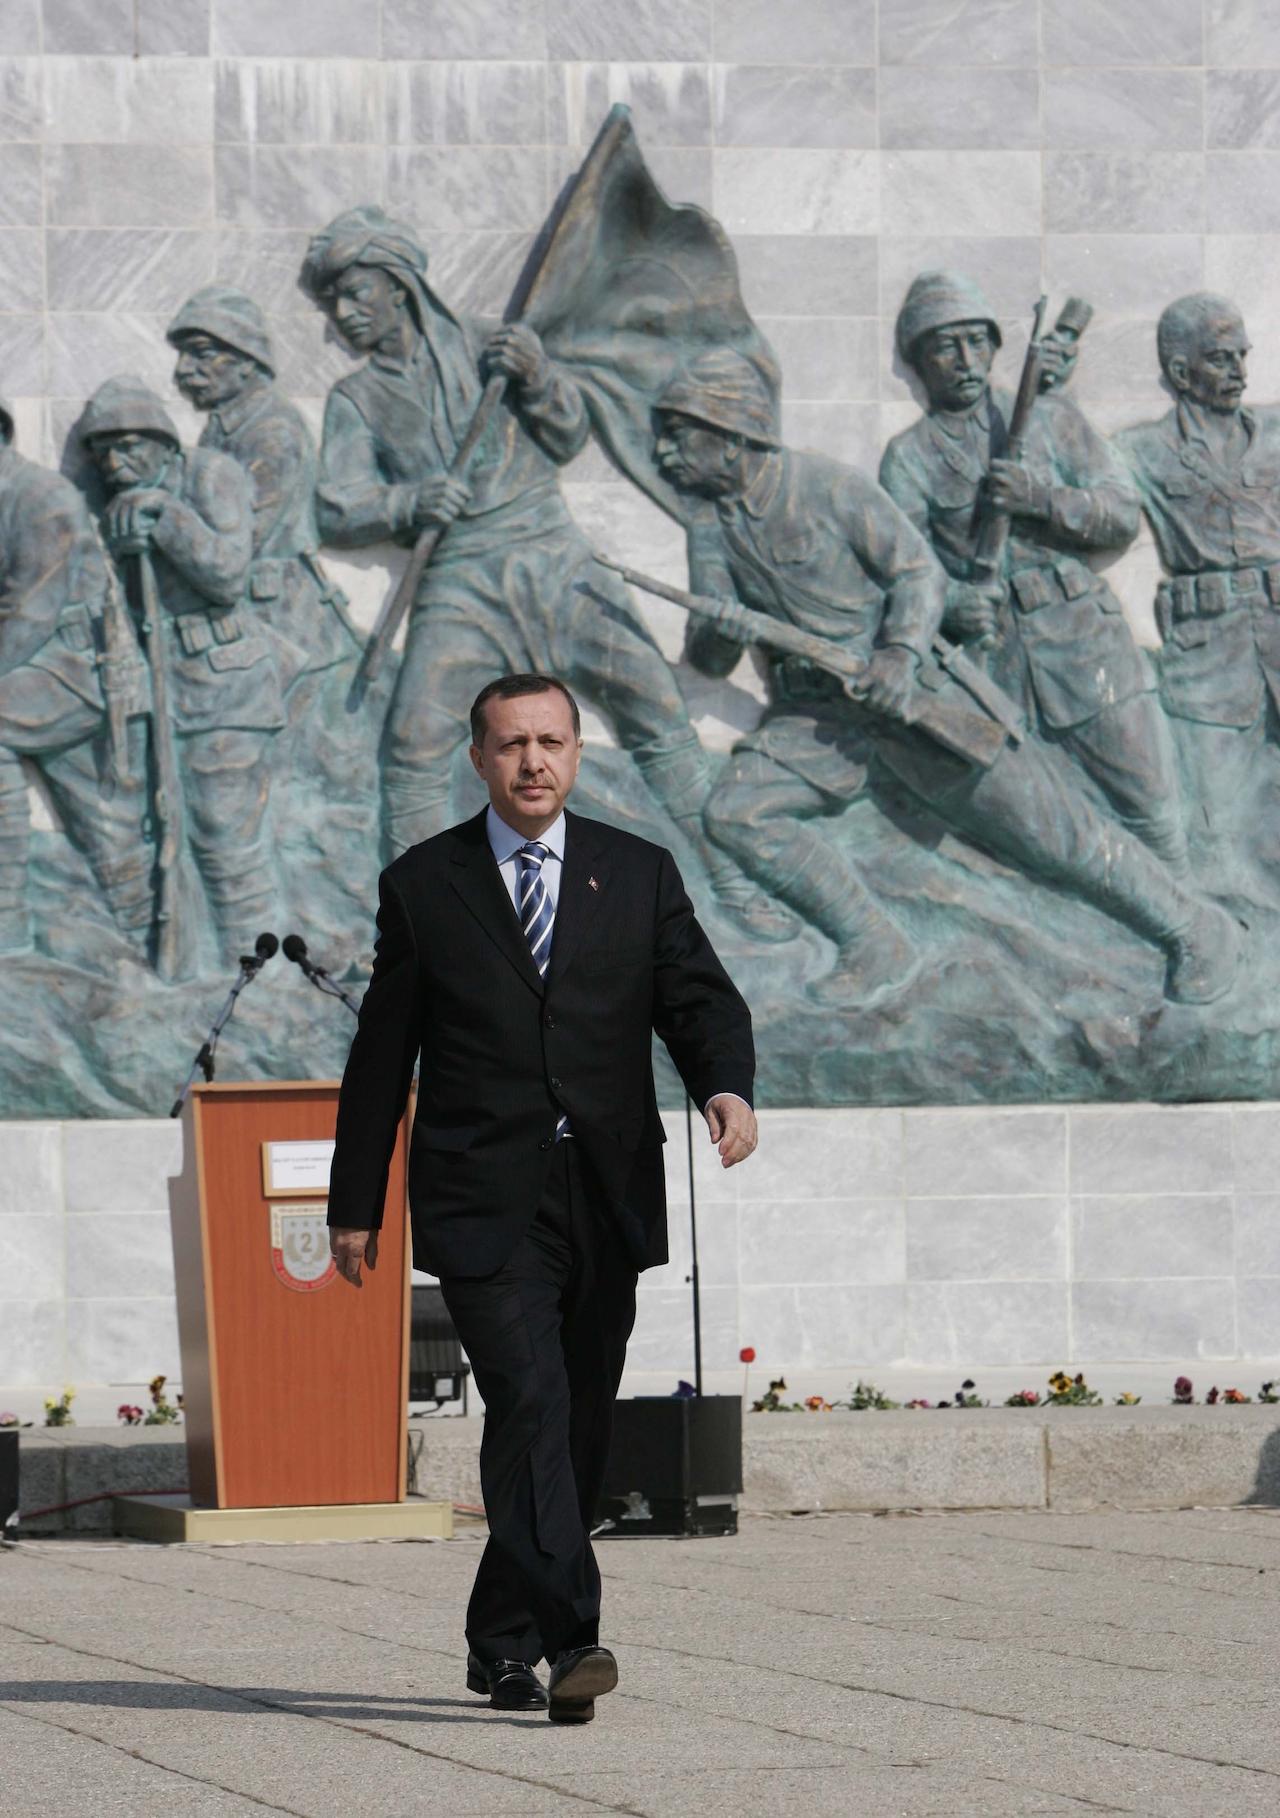 Recep Tayyip Erdoğan at the Çanakkale Martyrs' Memorial (photo by Randam, via Wikimedia Commons)